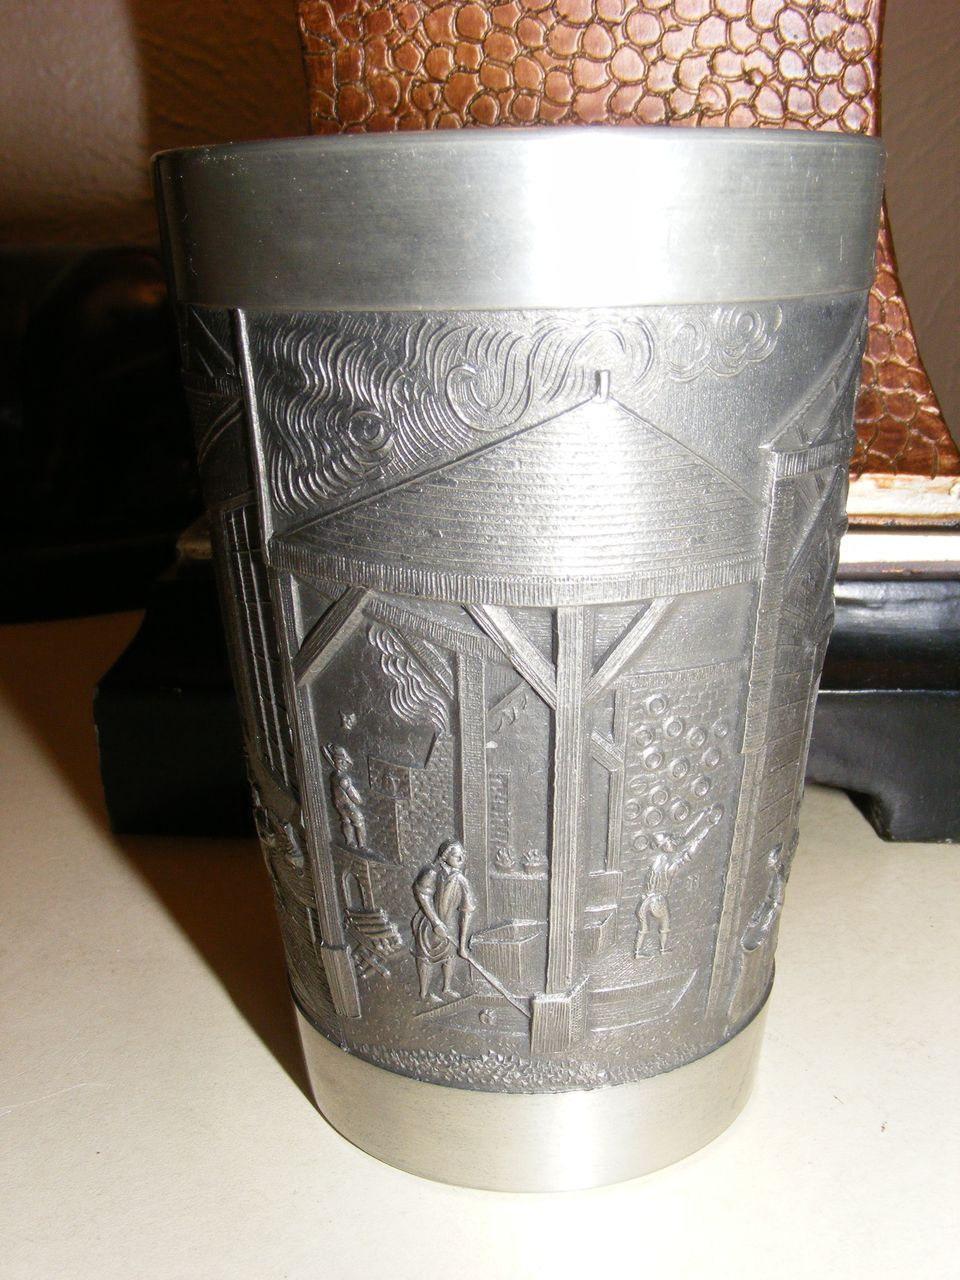 Vintage Pewter Cup - Degussa - Das Atelier Porcelain Factory Floor Scene